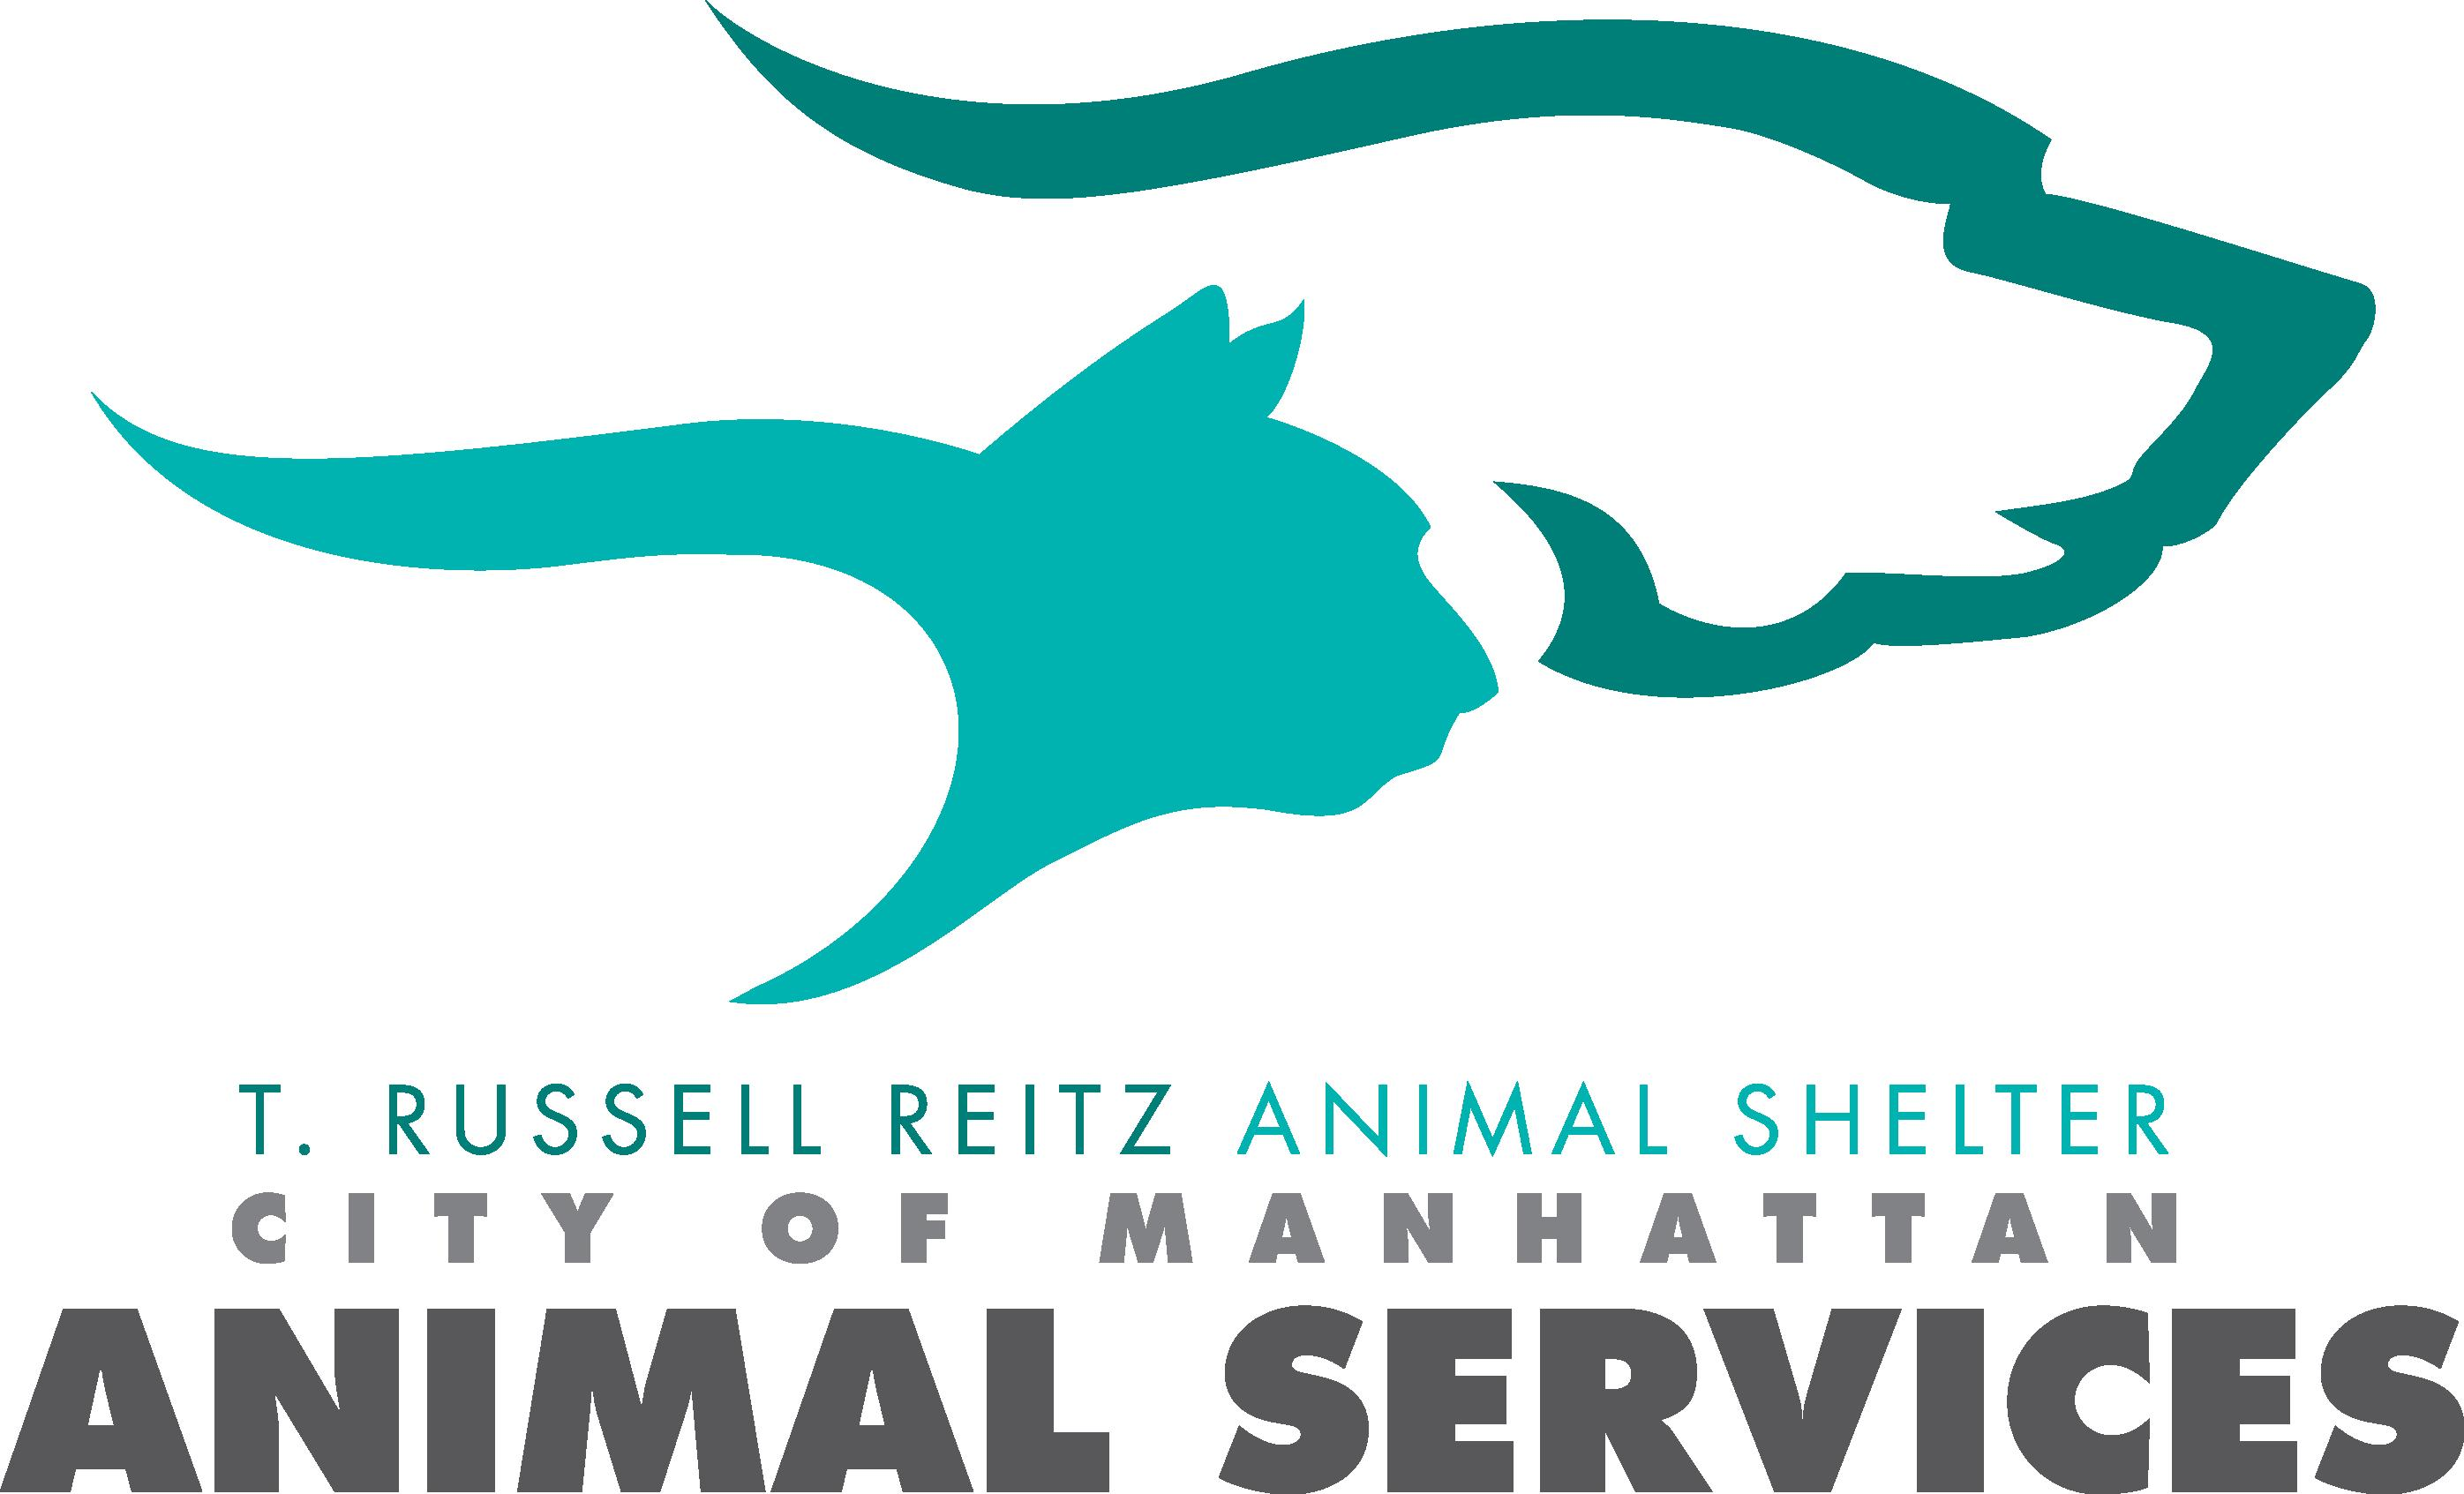 T. Russell Reitz Regional Animal Shelter